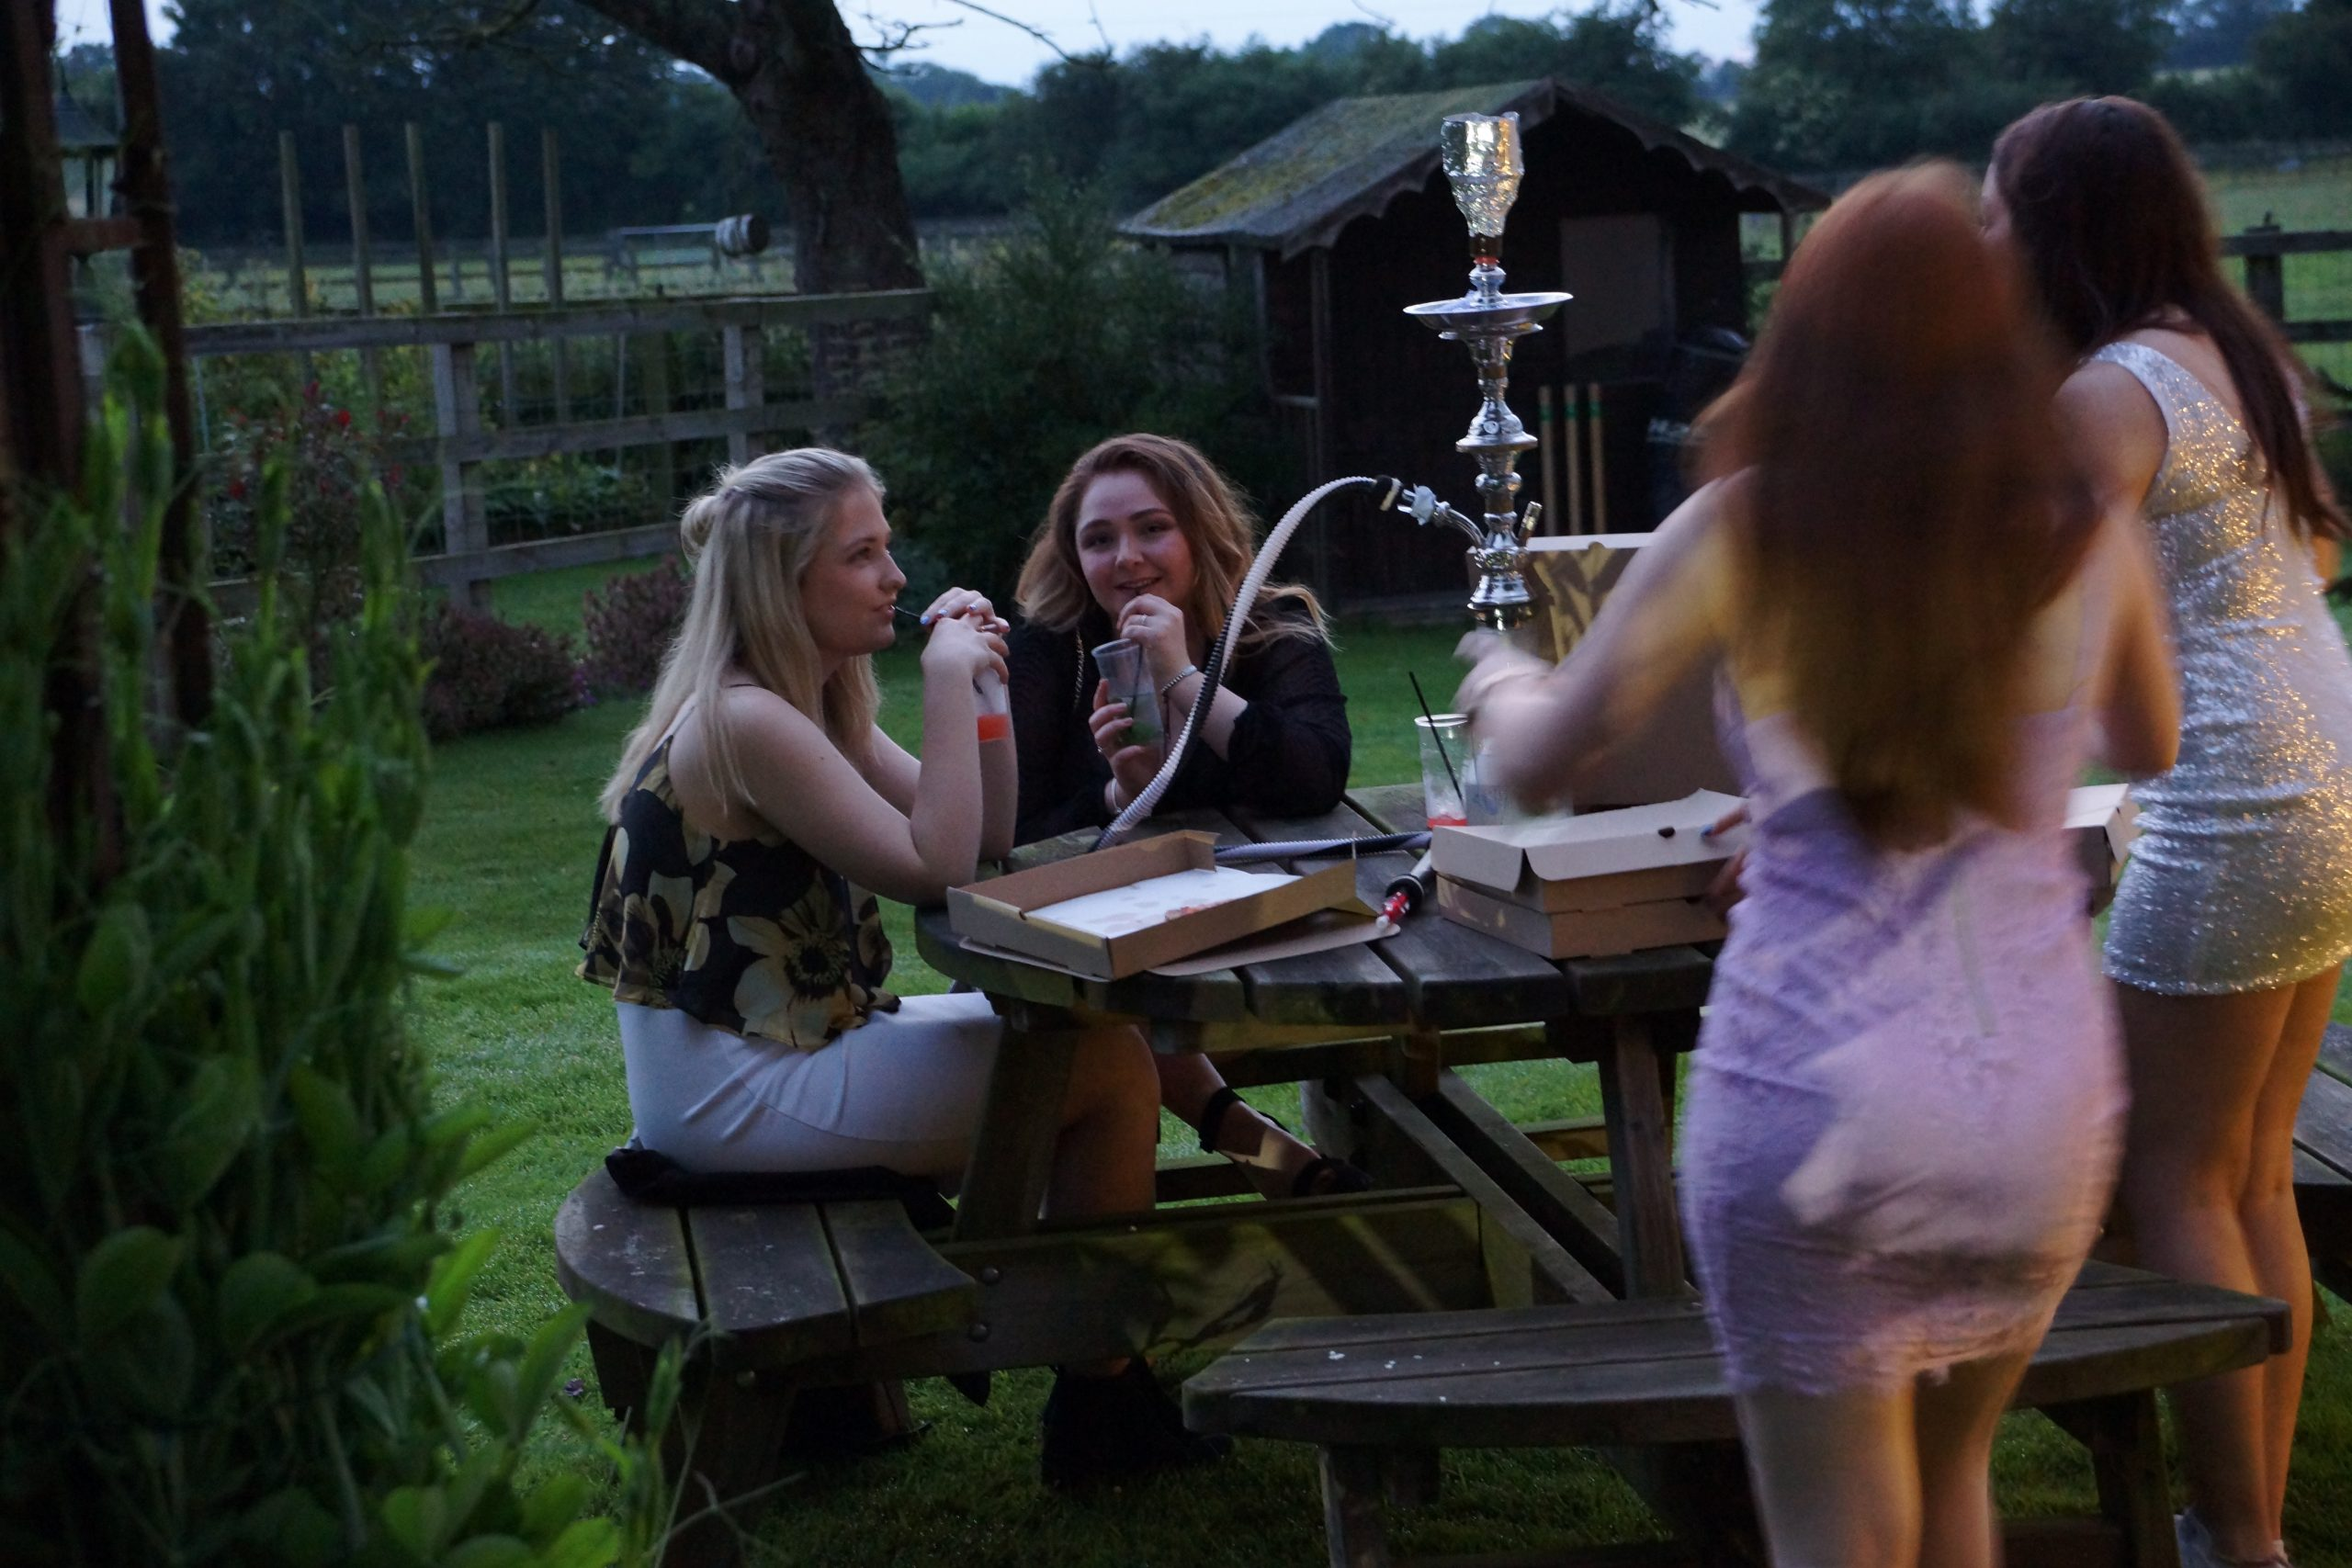 Luxury Shisha Hire Sevenoaks Package - Birthdays, House Parties, Corporate Events & Weddings